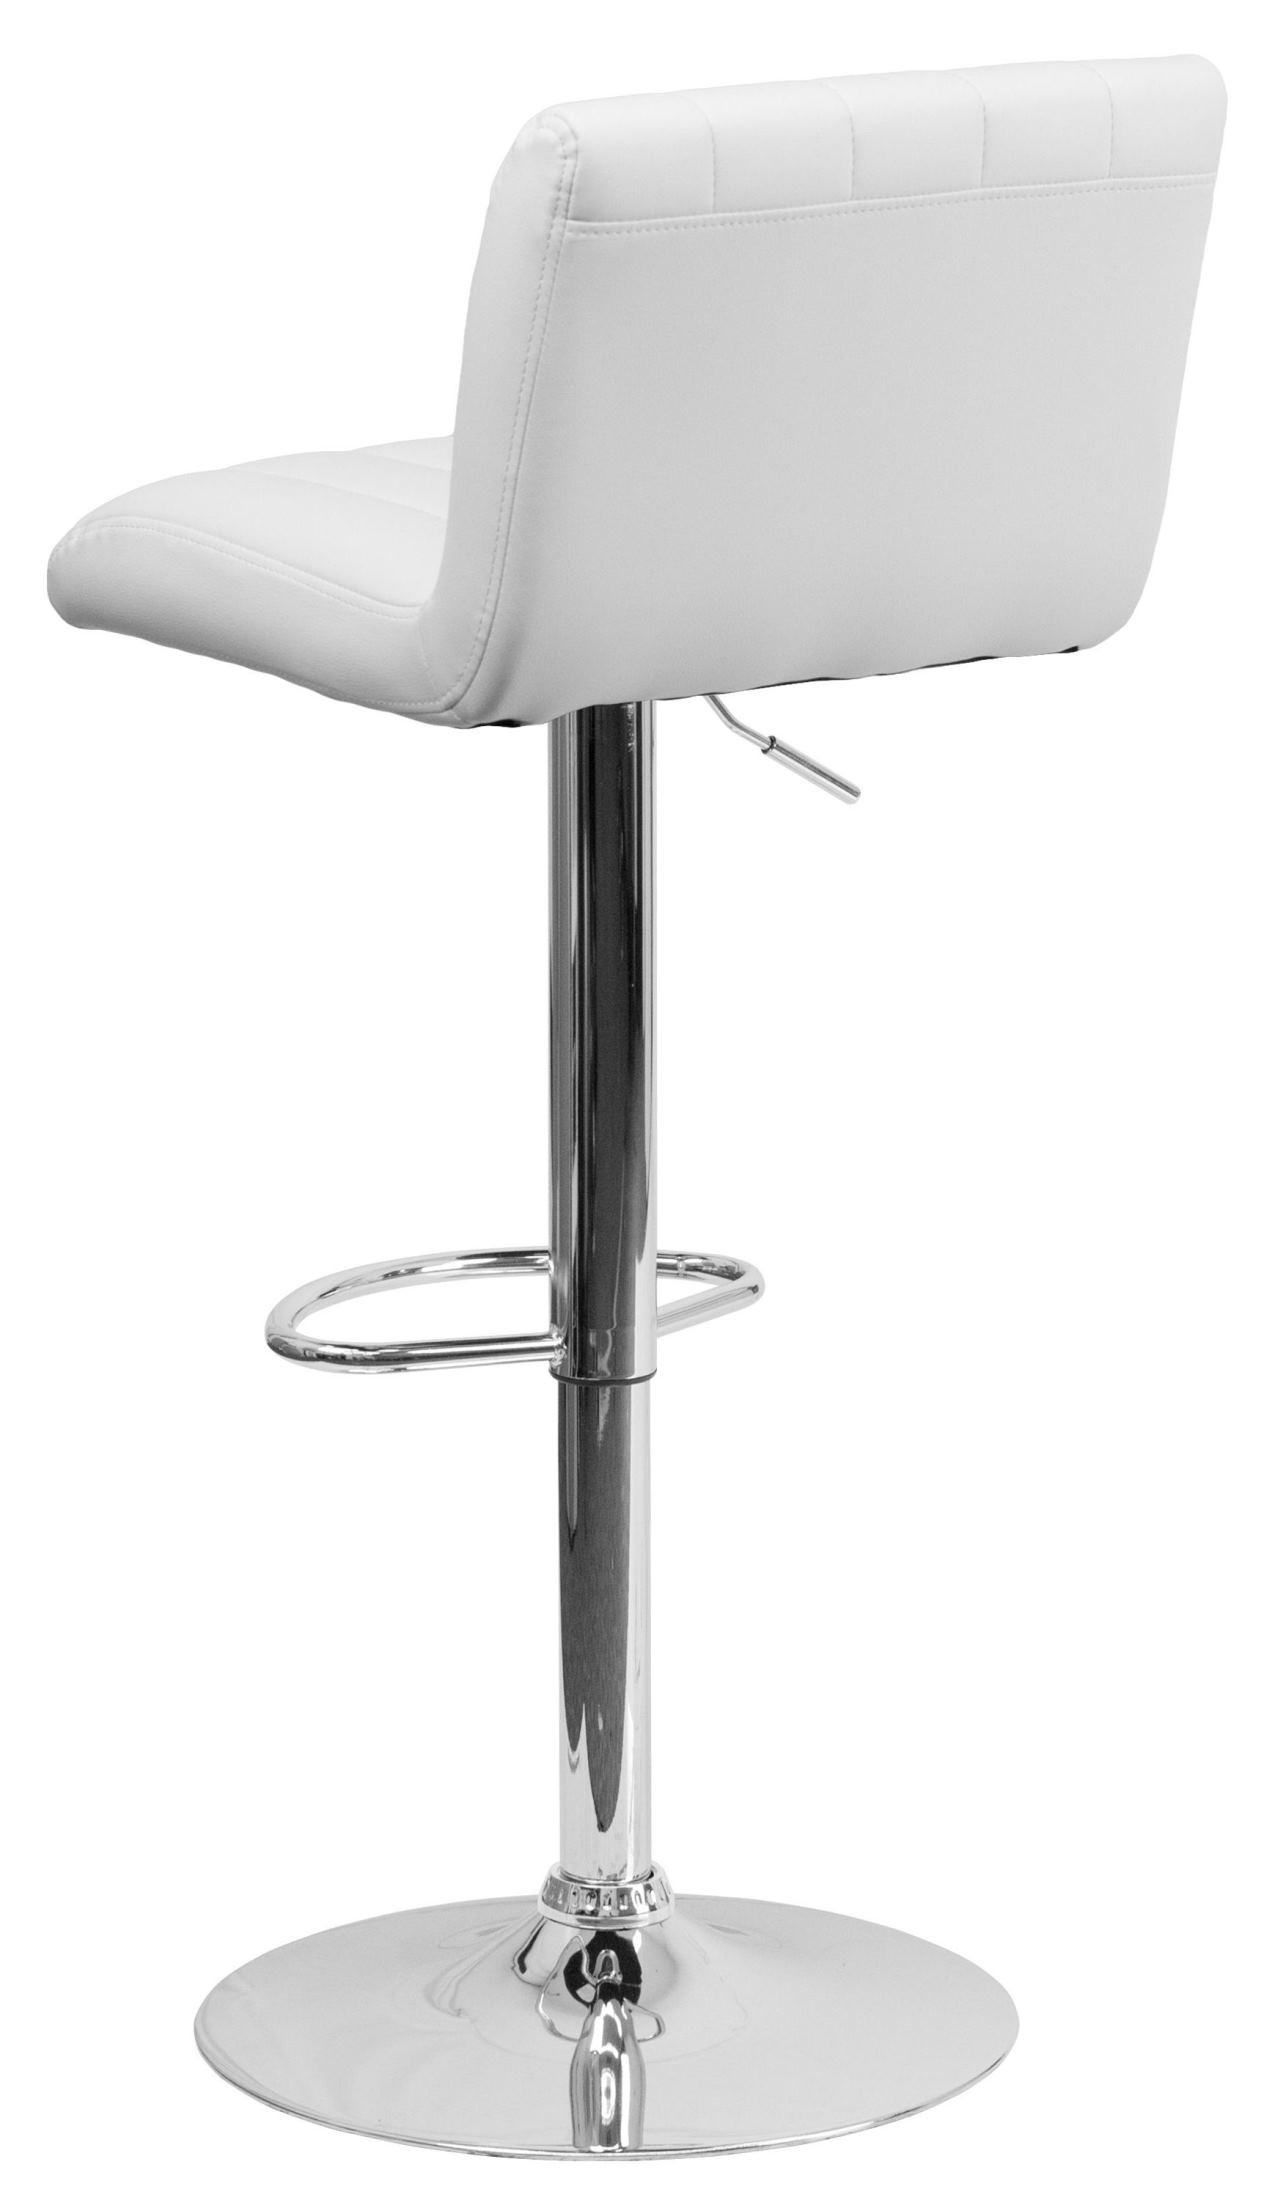 1000559 White Vinyl Adjustable Height Bar Stool From